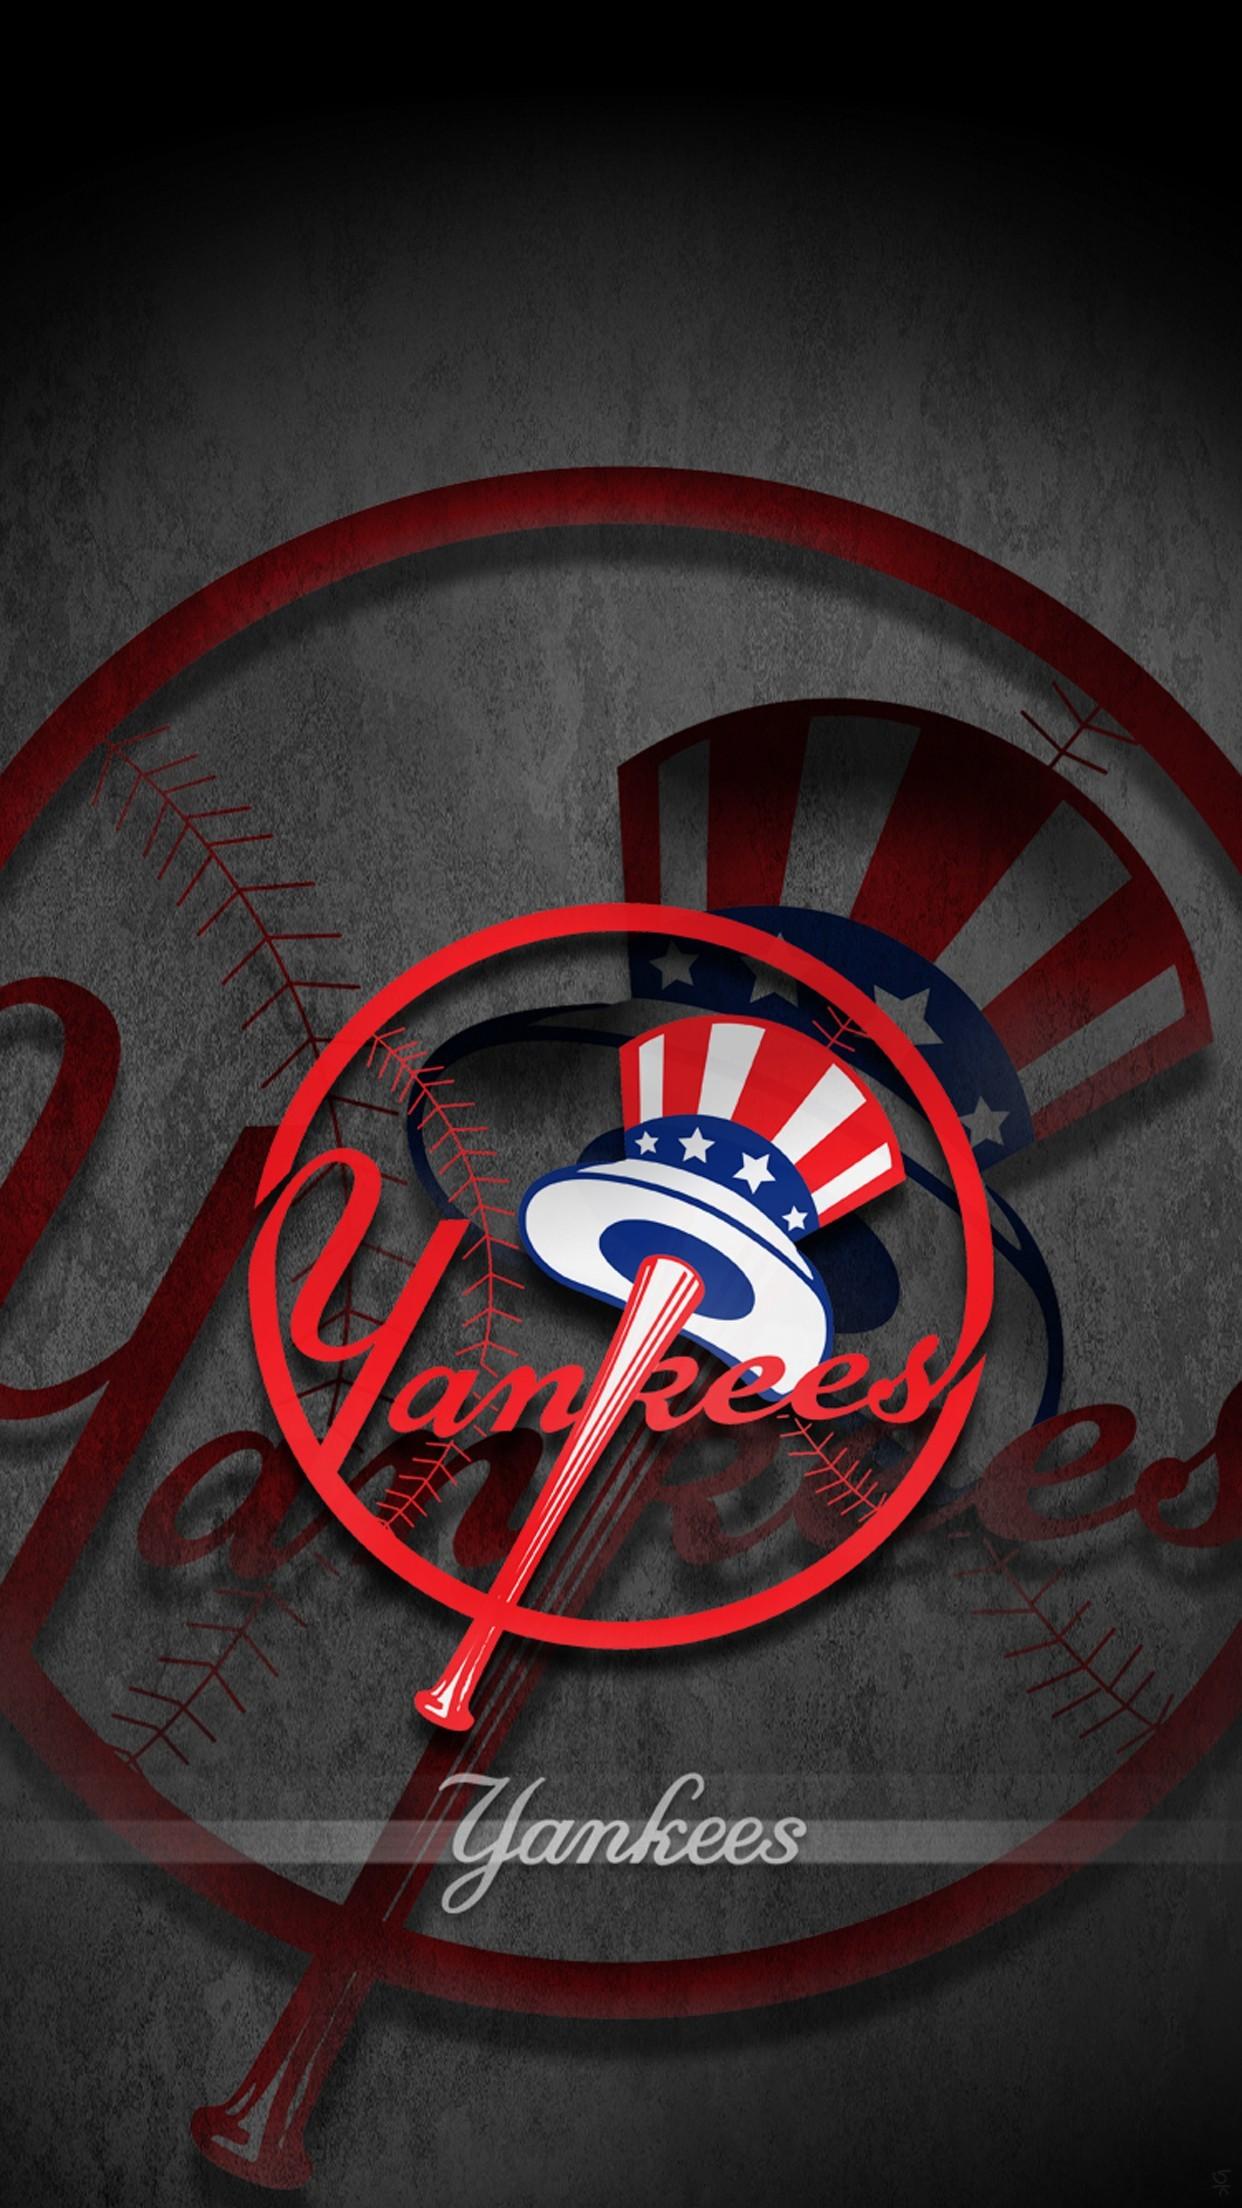 Yankee logo wallpaper